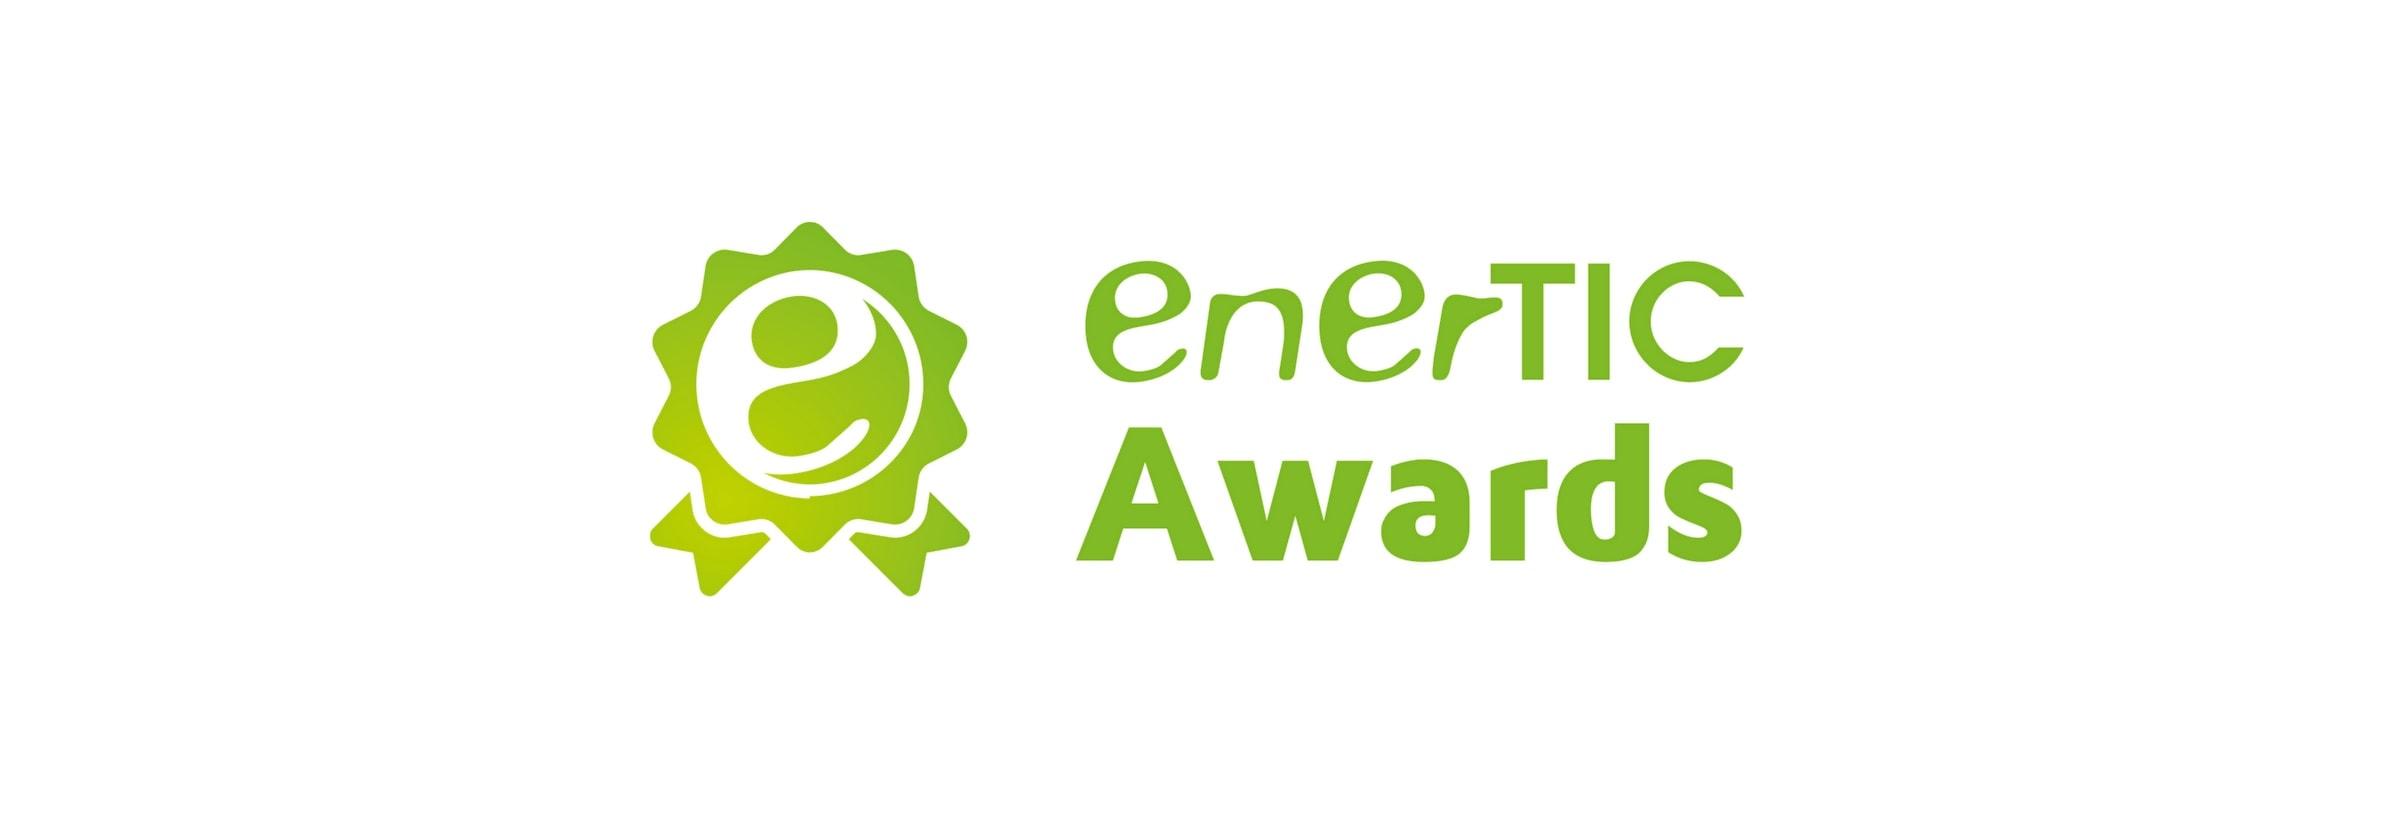 premios enertic award ferrovial 2018